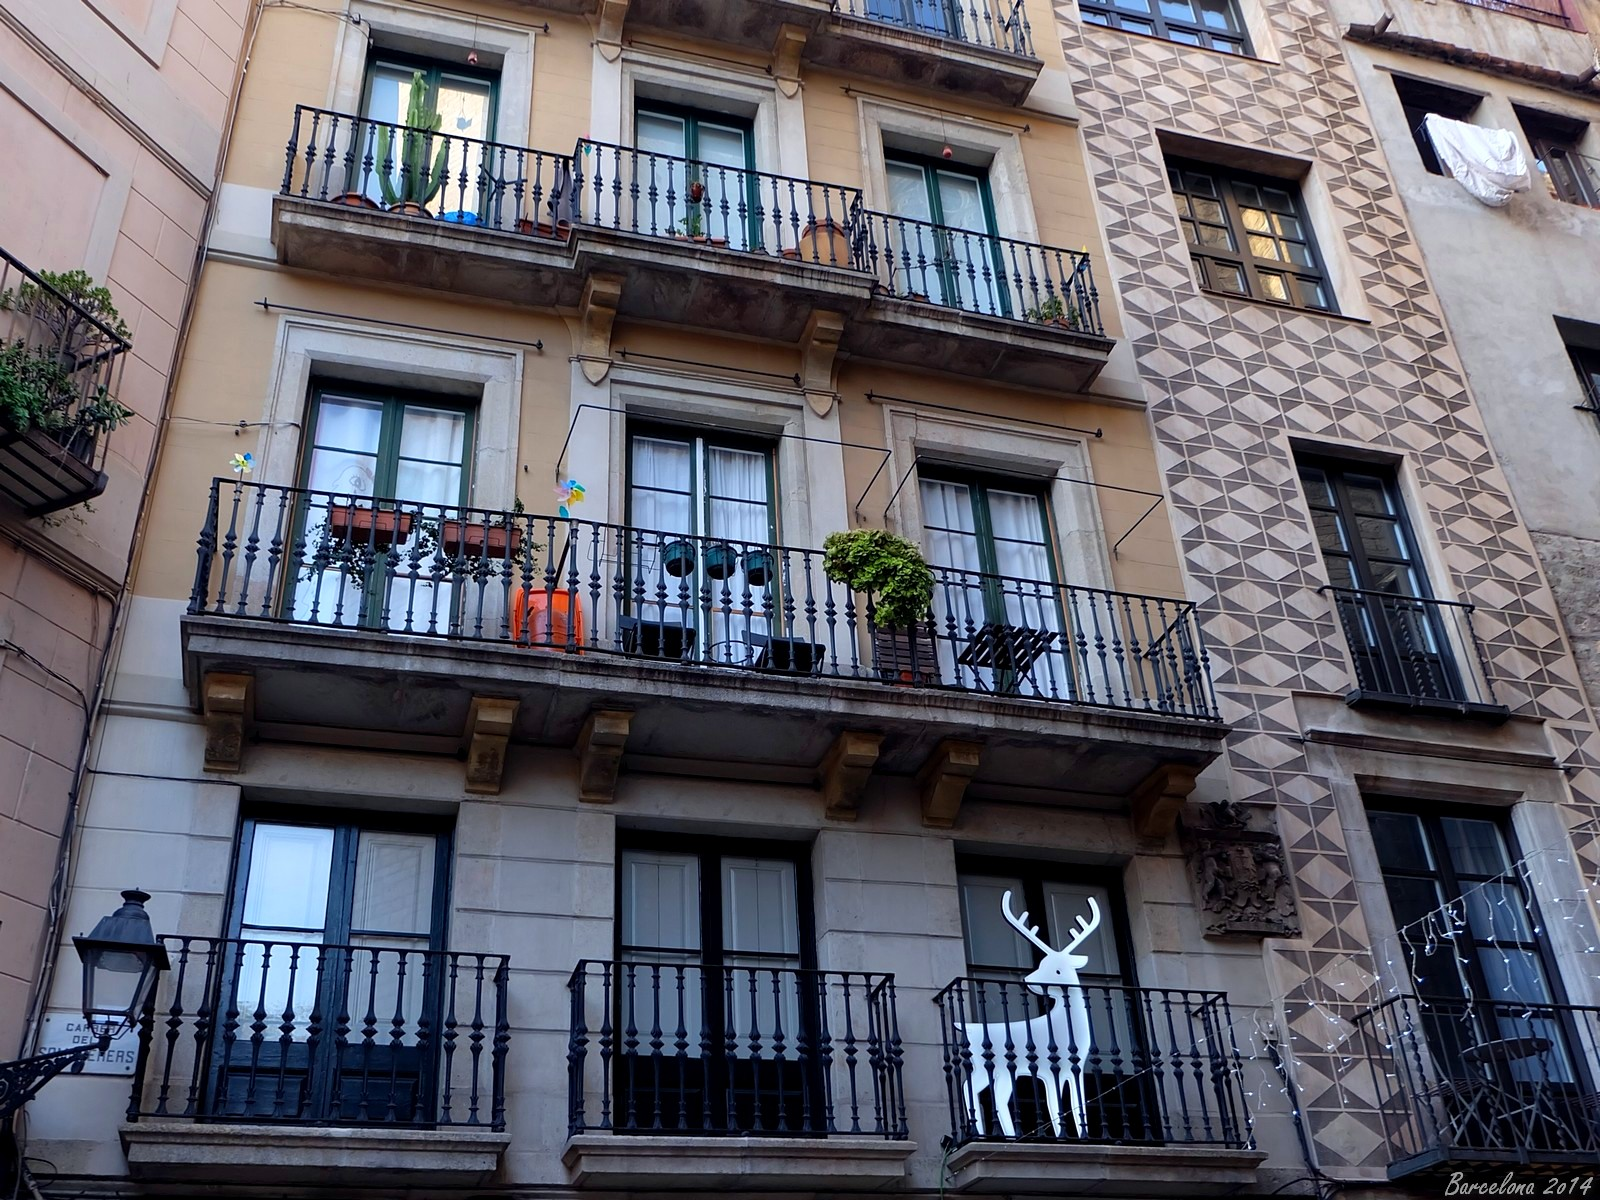 Barcelona day_1